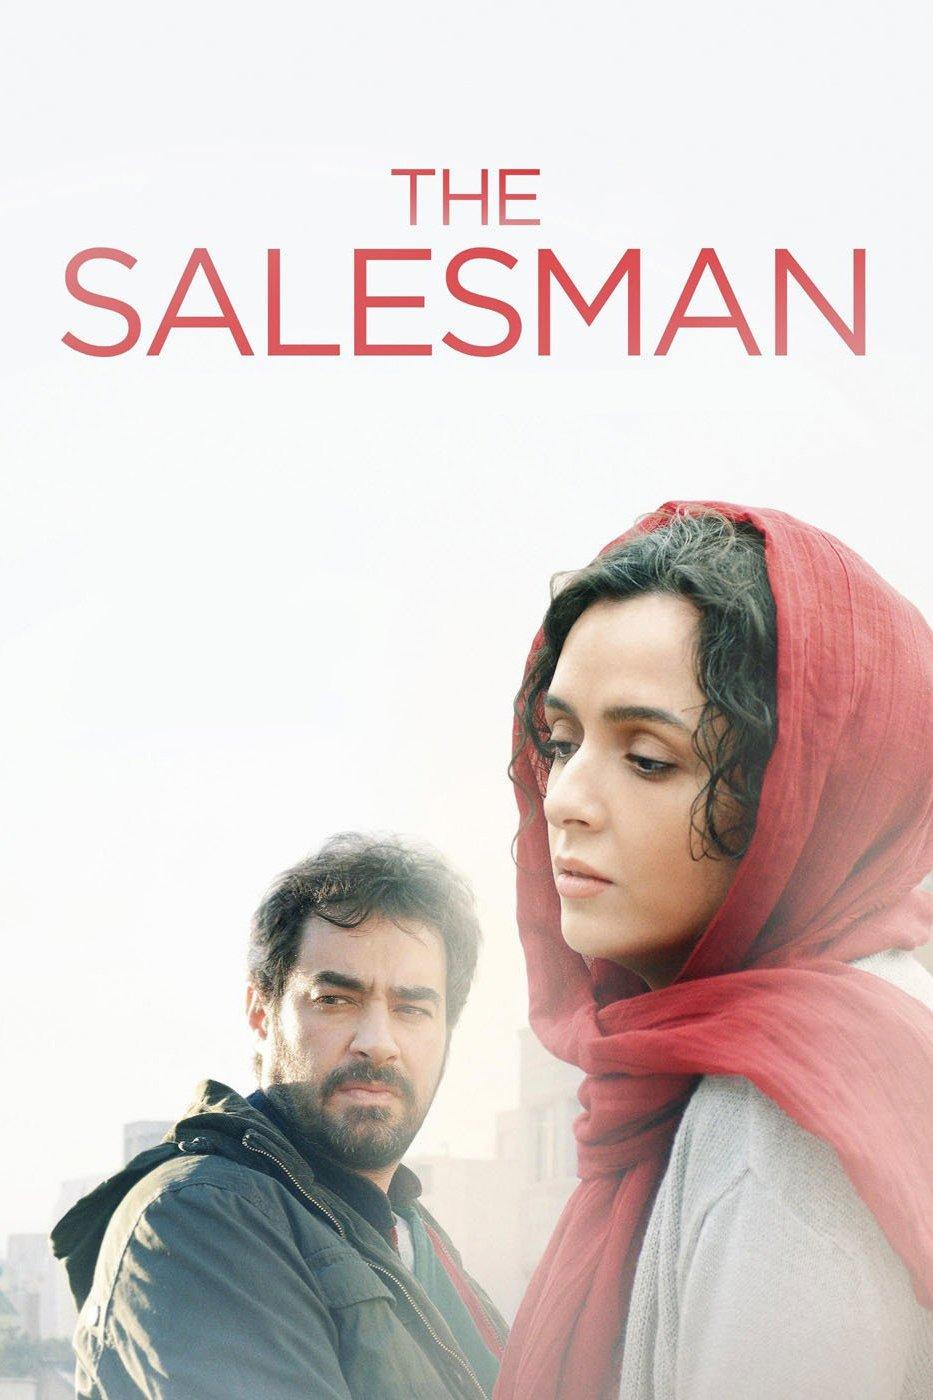 The Salesman - Movie Poster